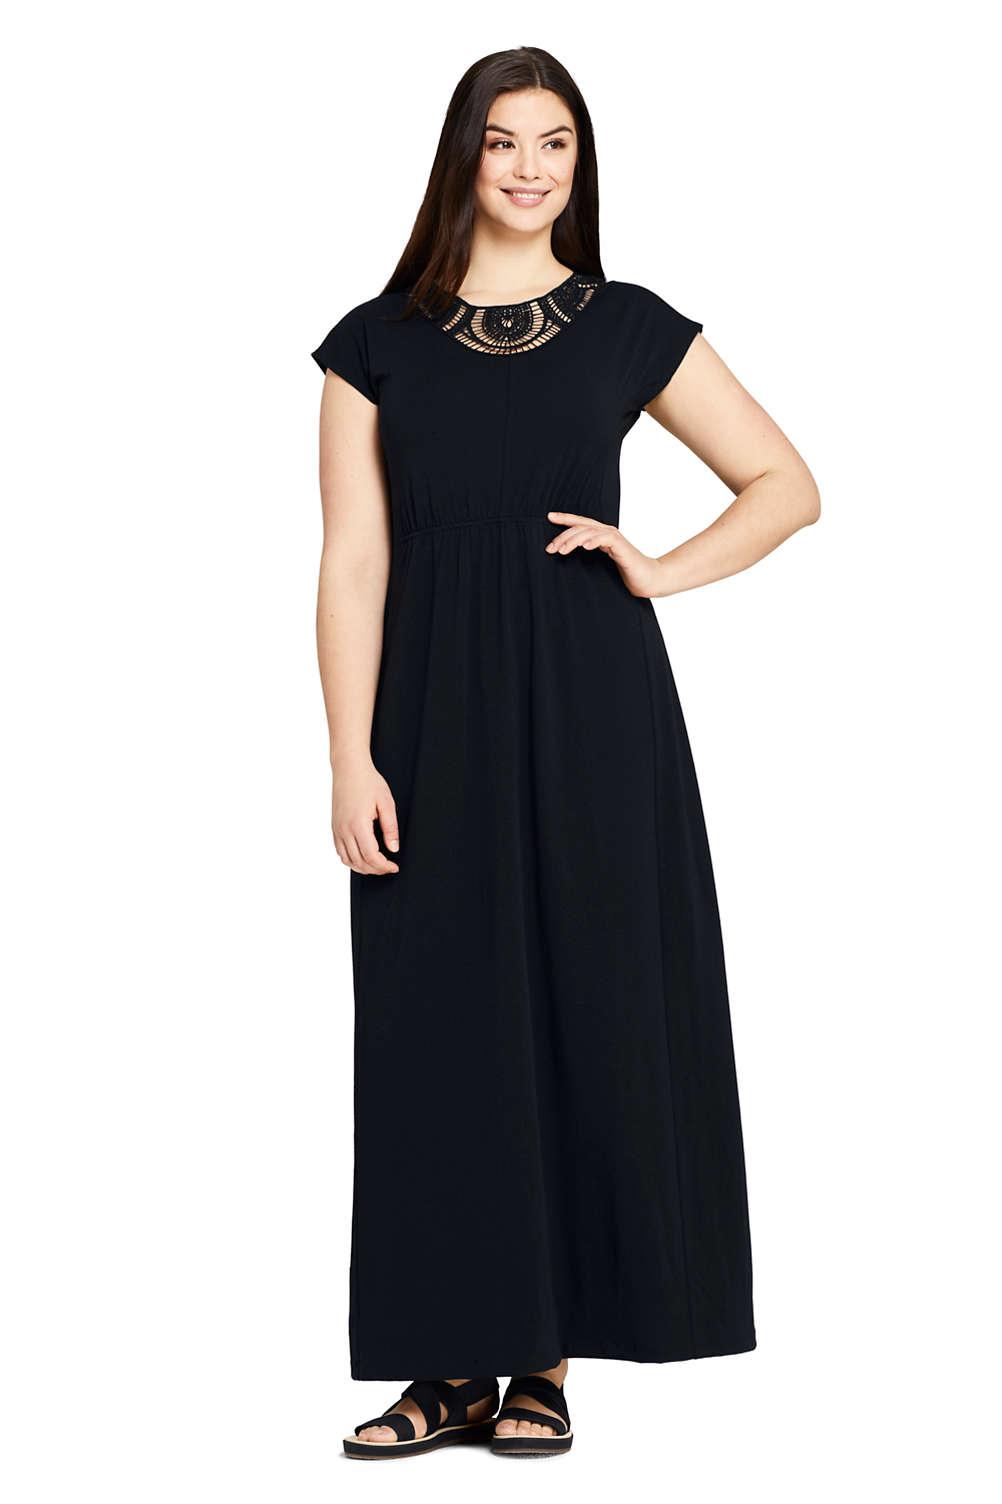 7e7b17b15 Women's Plus Size Short Sleeve Knit Crochet Neck Maxi Dress from Lands' End